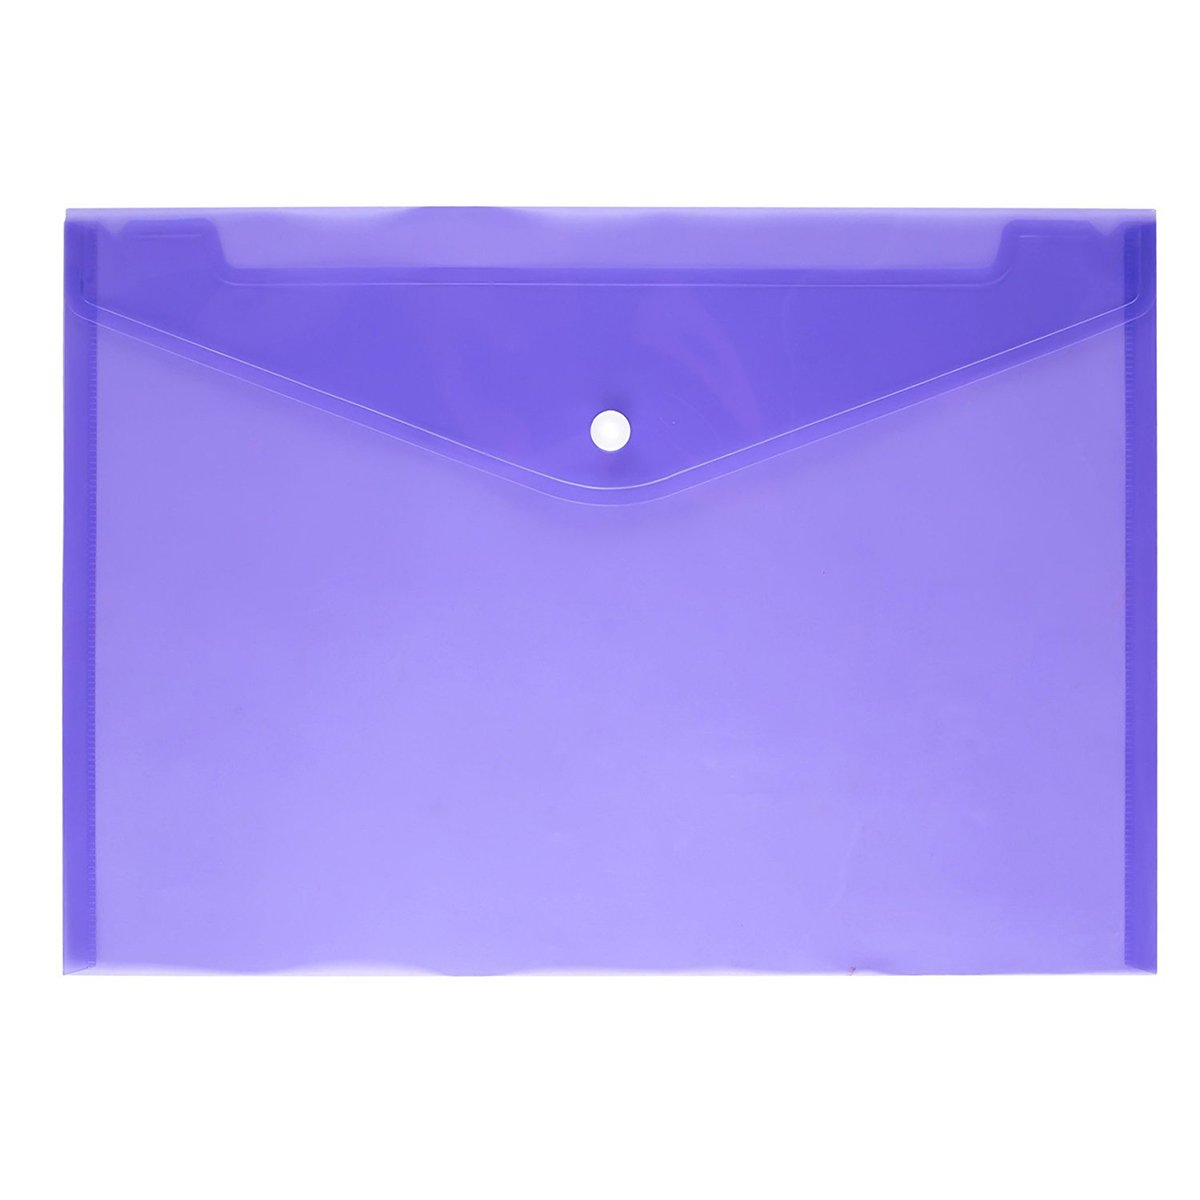 24 Pezzi TOYMYTOY Portadocumenti Buste per documenti in polipropilene A4 trasparente con Bottone